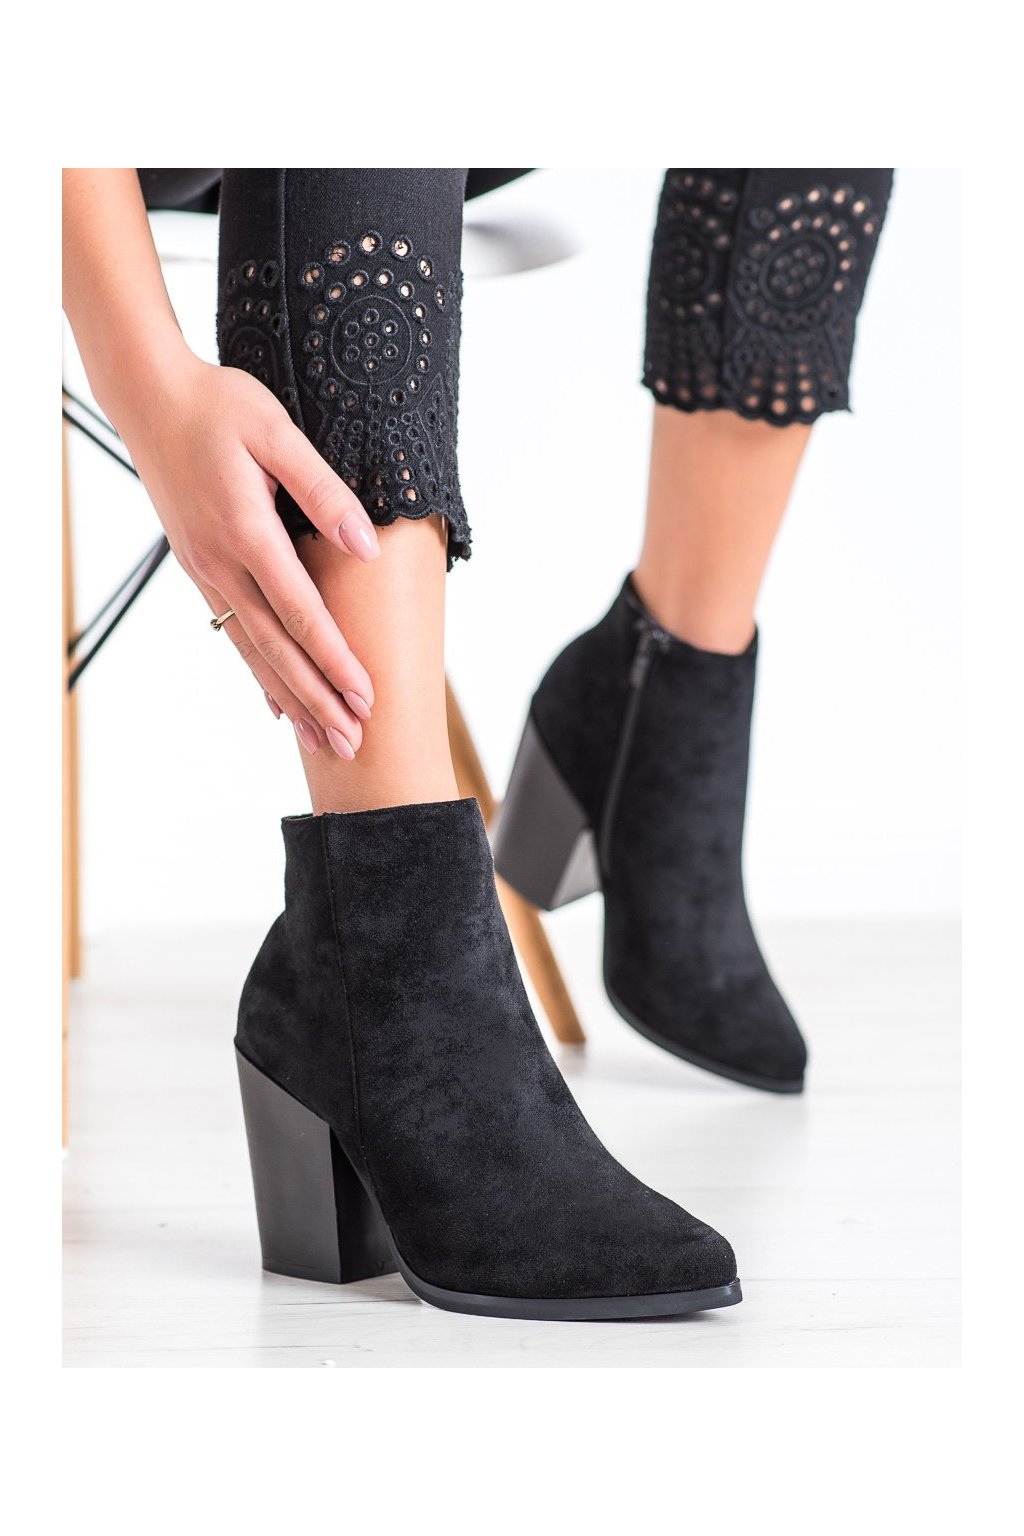 Čierne dámske topánky Marquiz kod TX-3207B